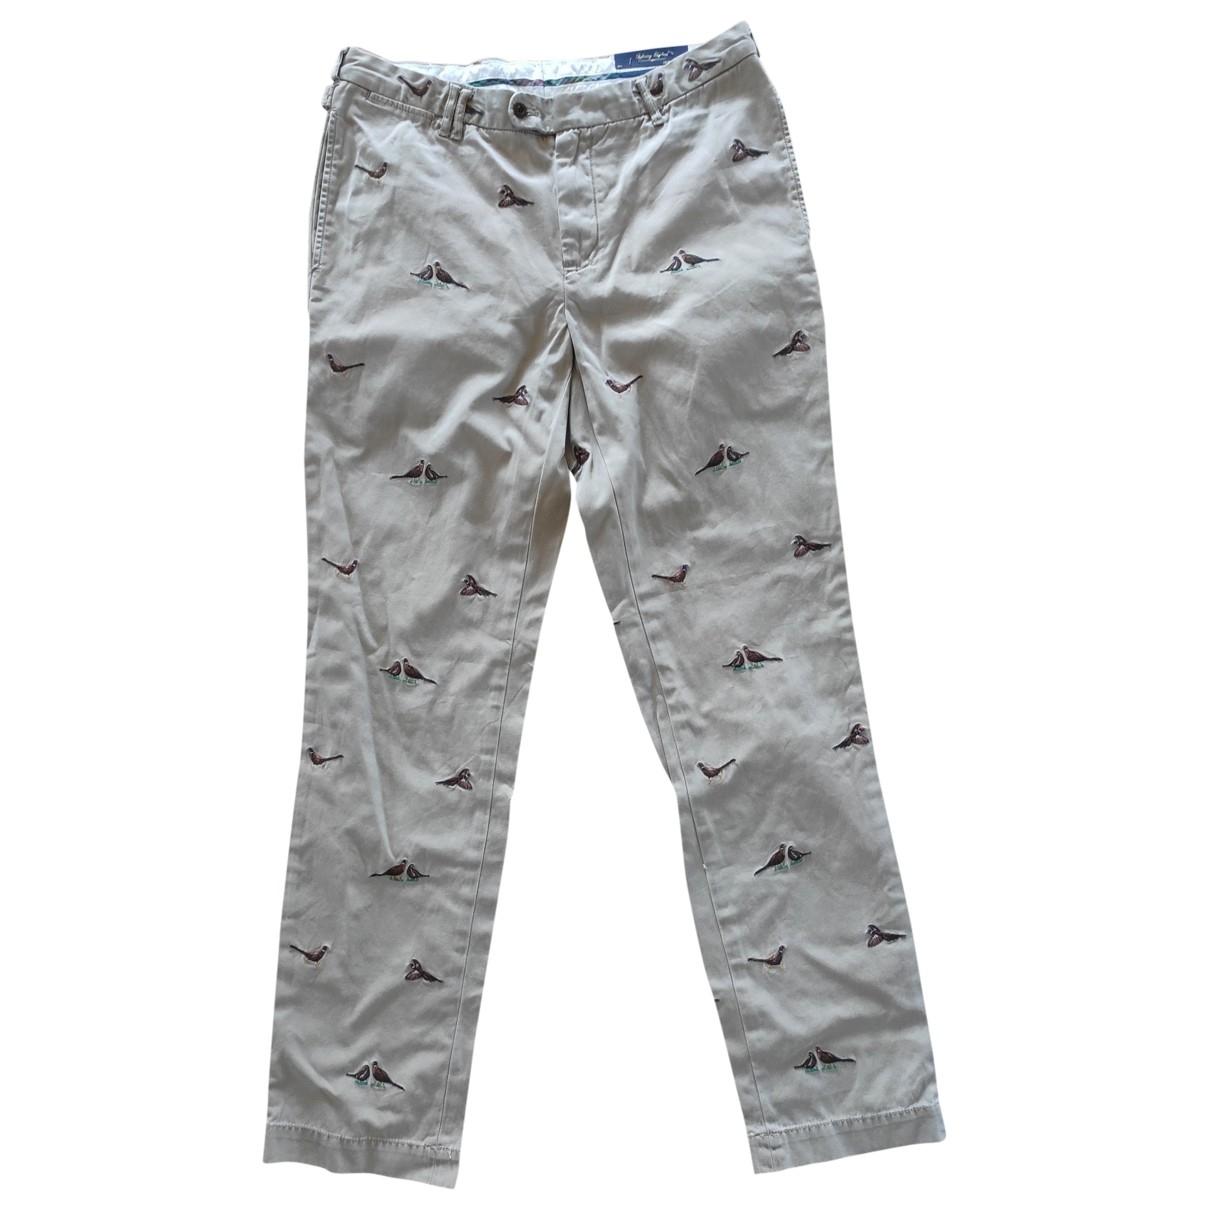 Polo Ralph Lauren \N Camel Cotton Trousers for Men 34 UK - US